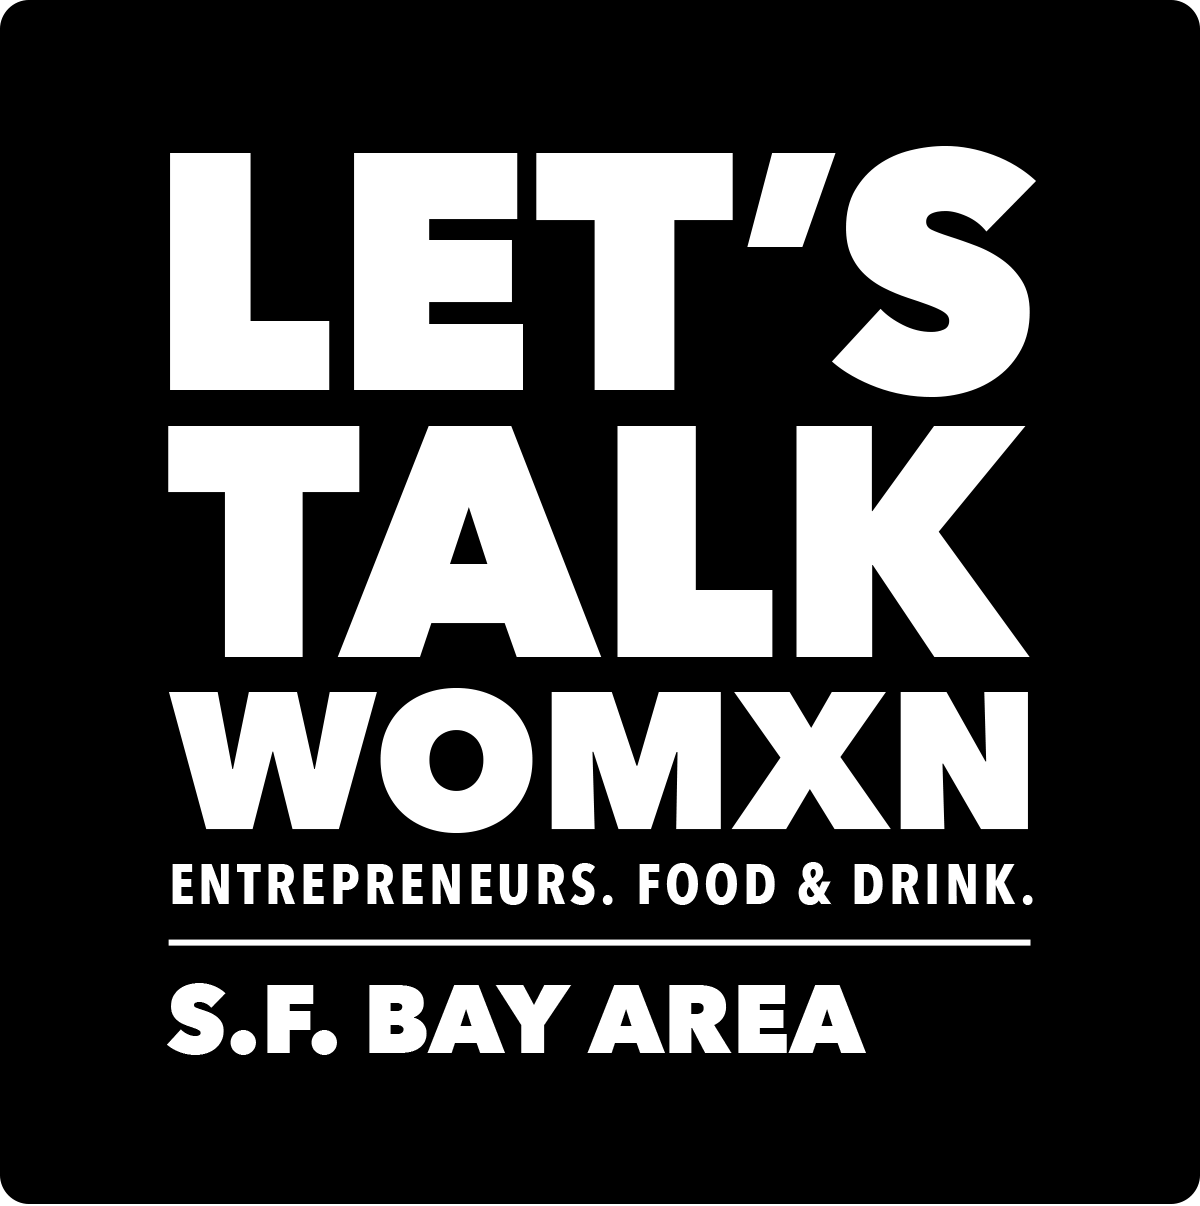 Let's Talk Womxn - San Francisco Bay Area